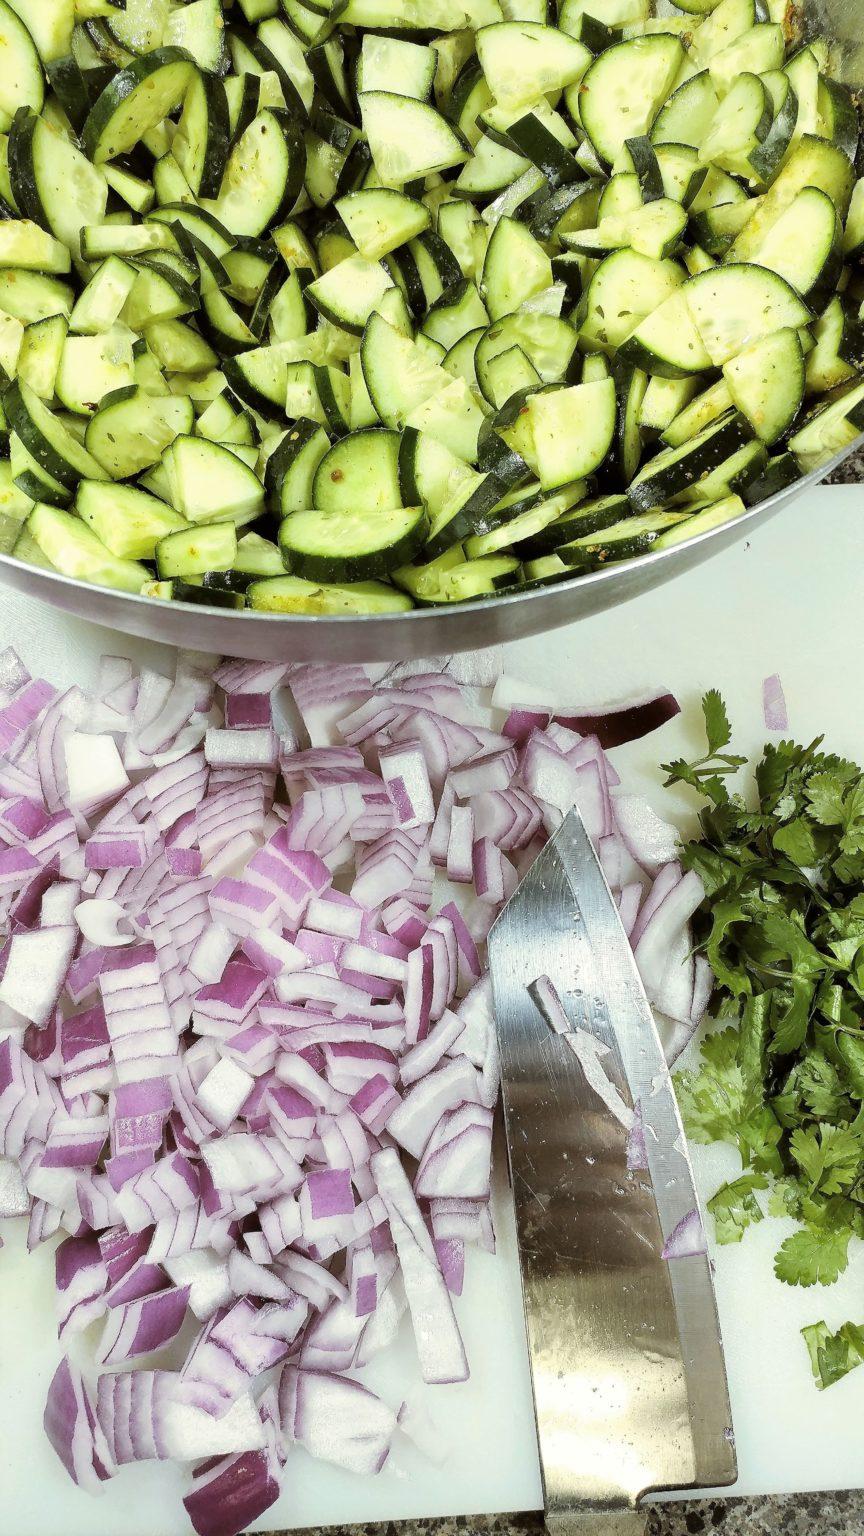 Thai Cucumber Salad Ingredients